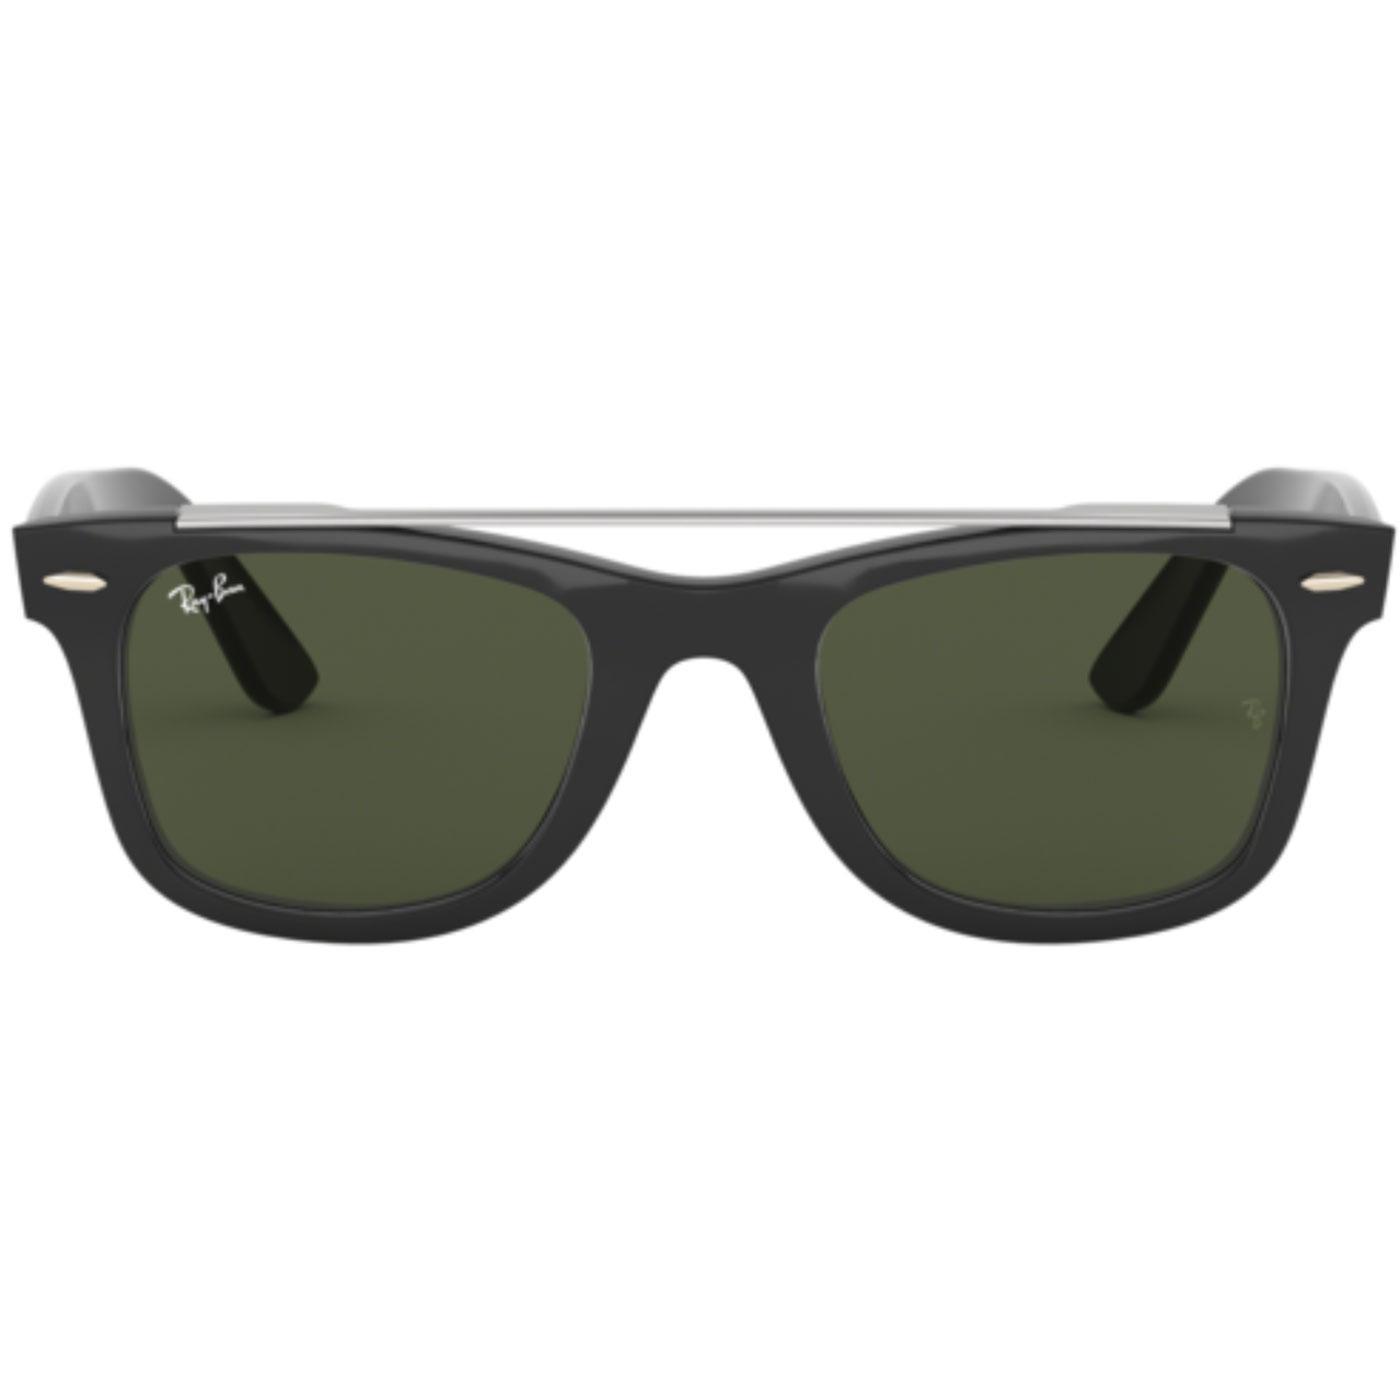 RAY-BAN Retro 70s Brow Bar Wayfarer Sunglasses